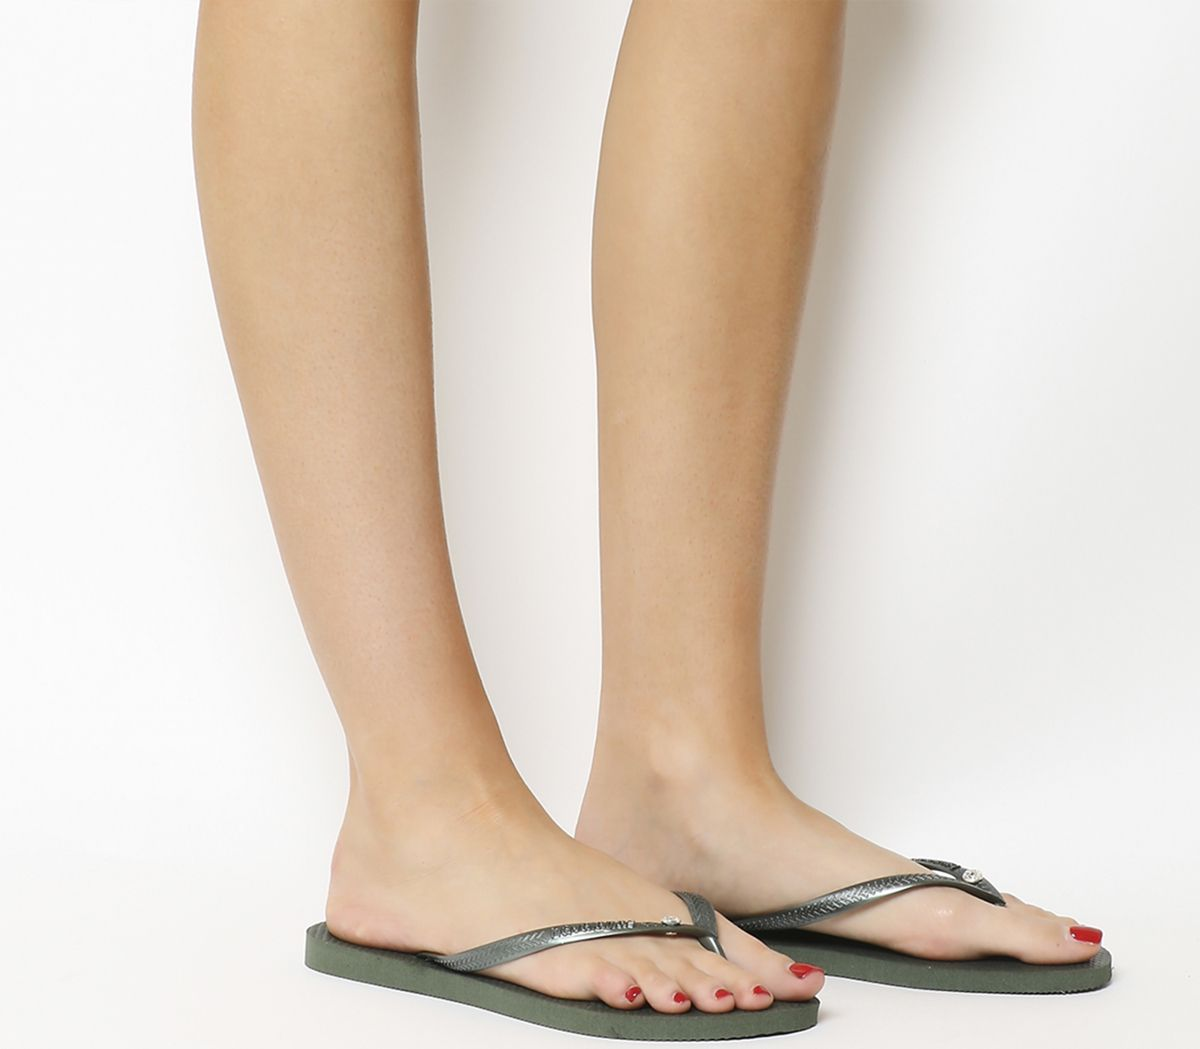 8be508a96ebb Havaianas Slim Crystal Glamour Flip Flops Olive - Sandals